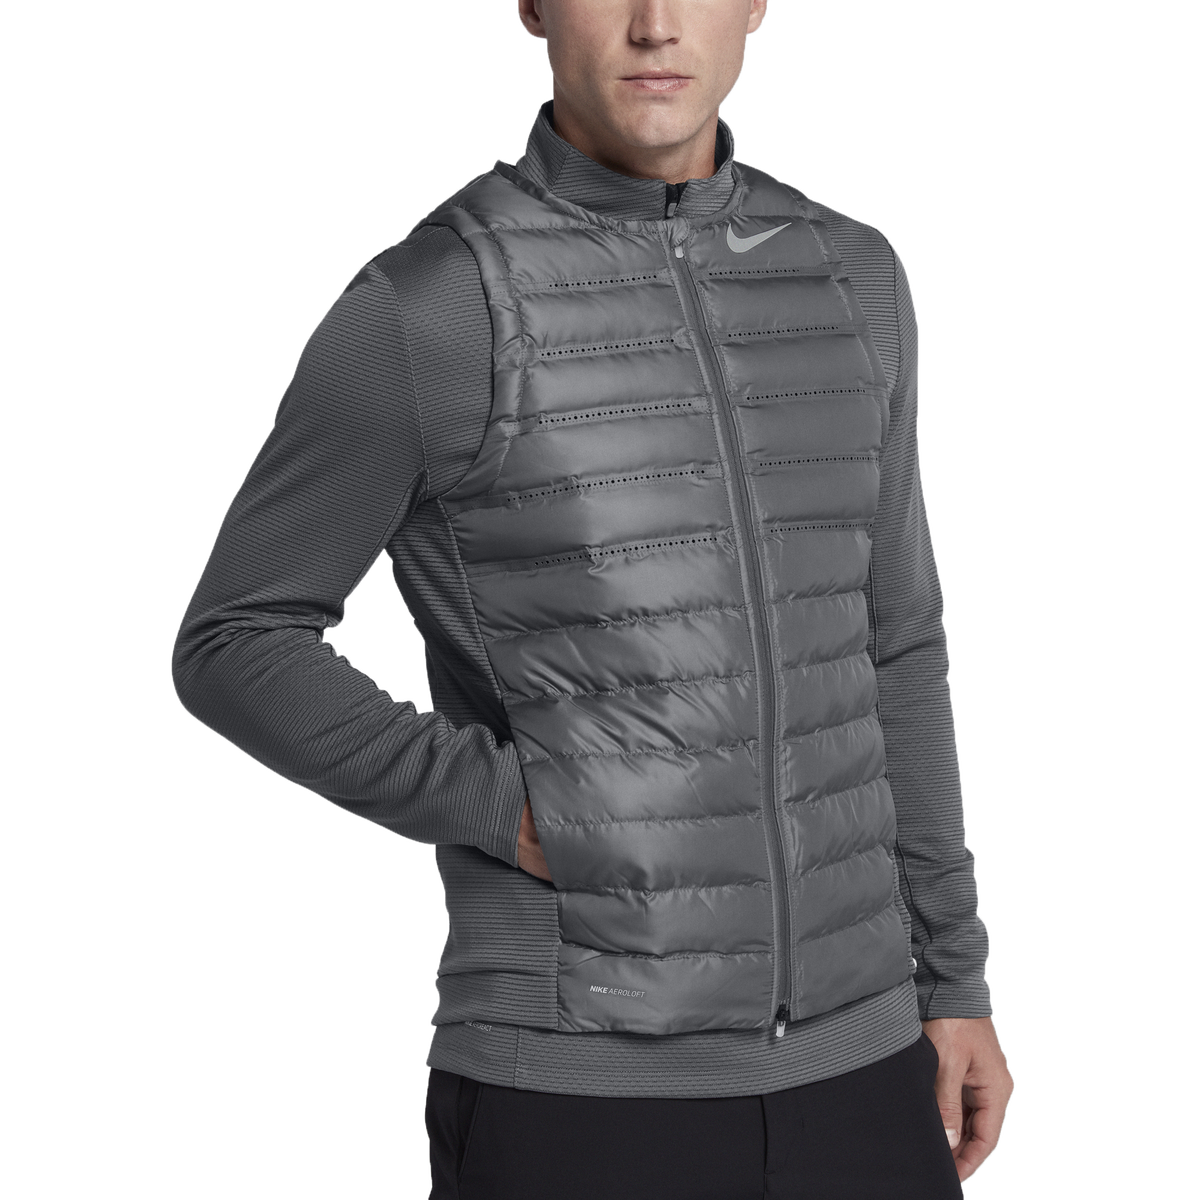 1fea59b51039 Images. Nike AeroLoft Golf Vest